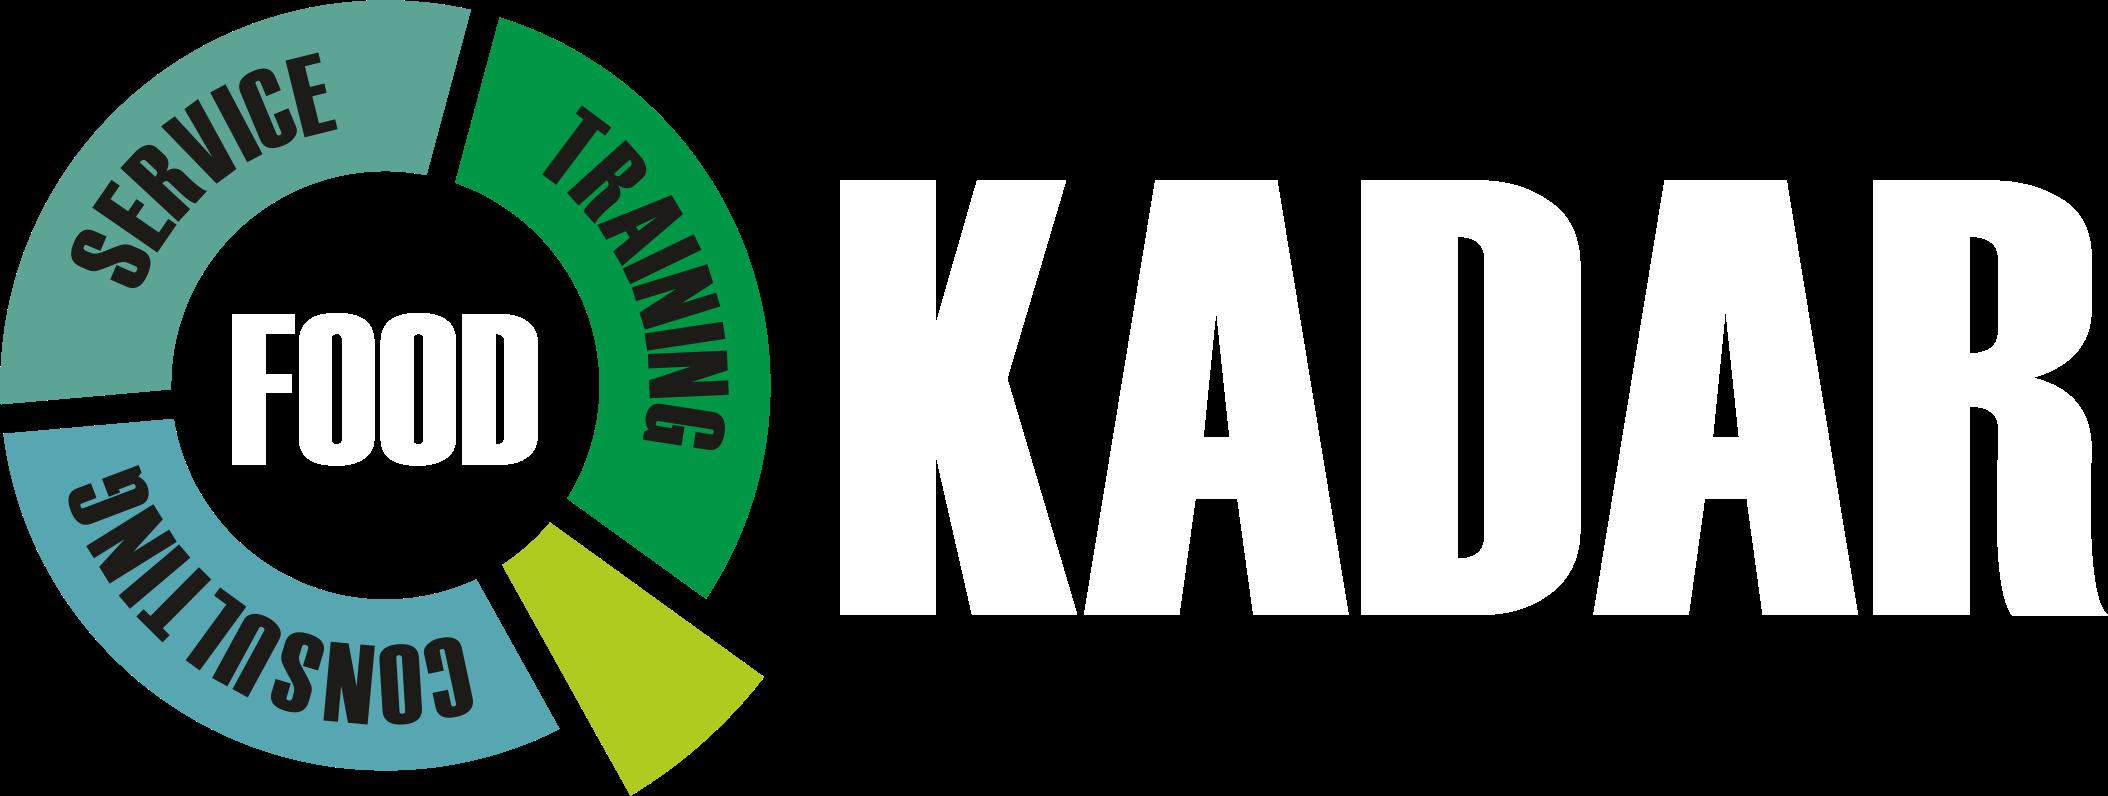 KADAR POLAND